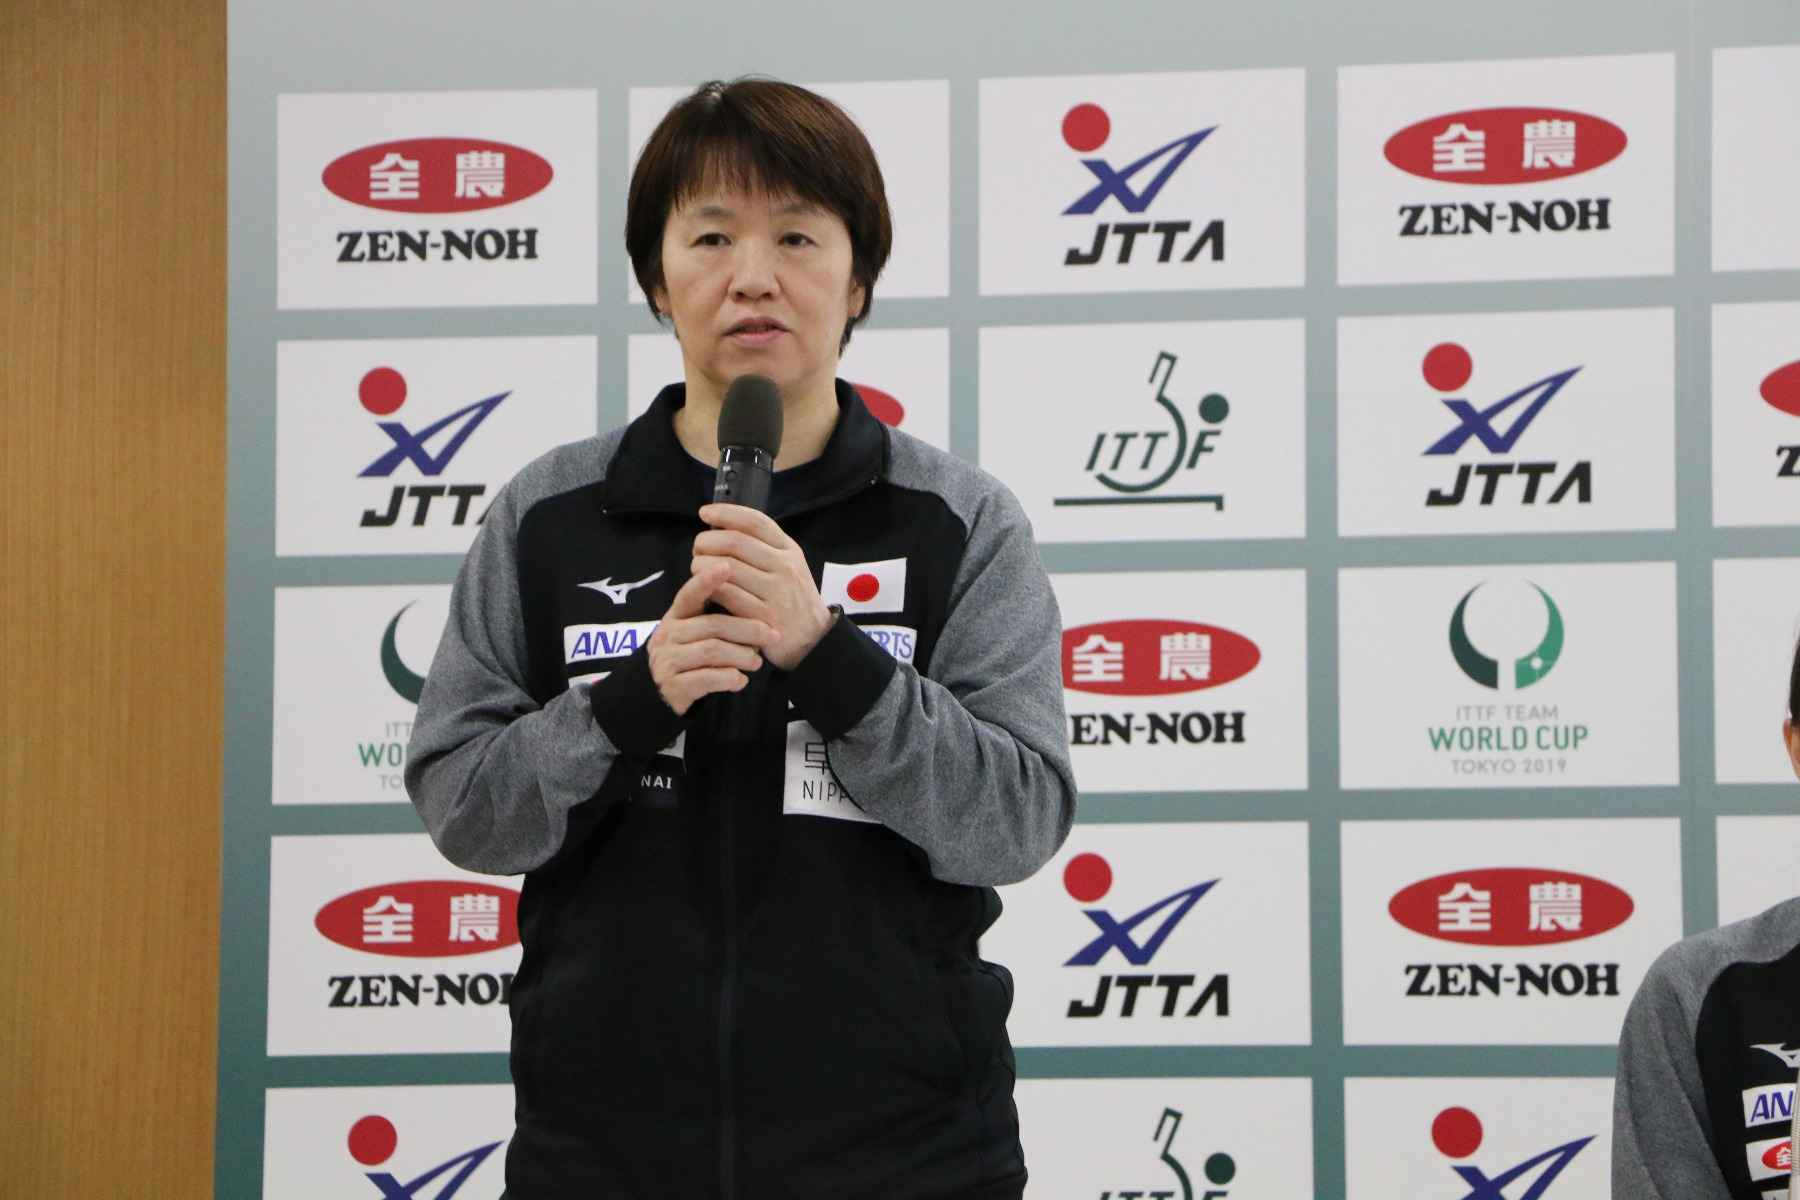 JA全農 チームワールドカップ 東京大会 開催記者発表 会見 馬場美香